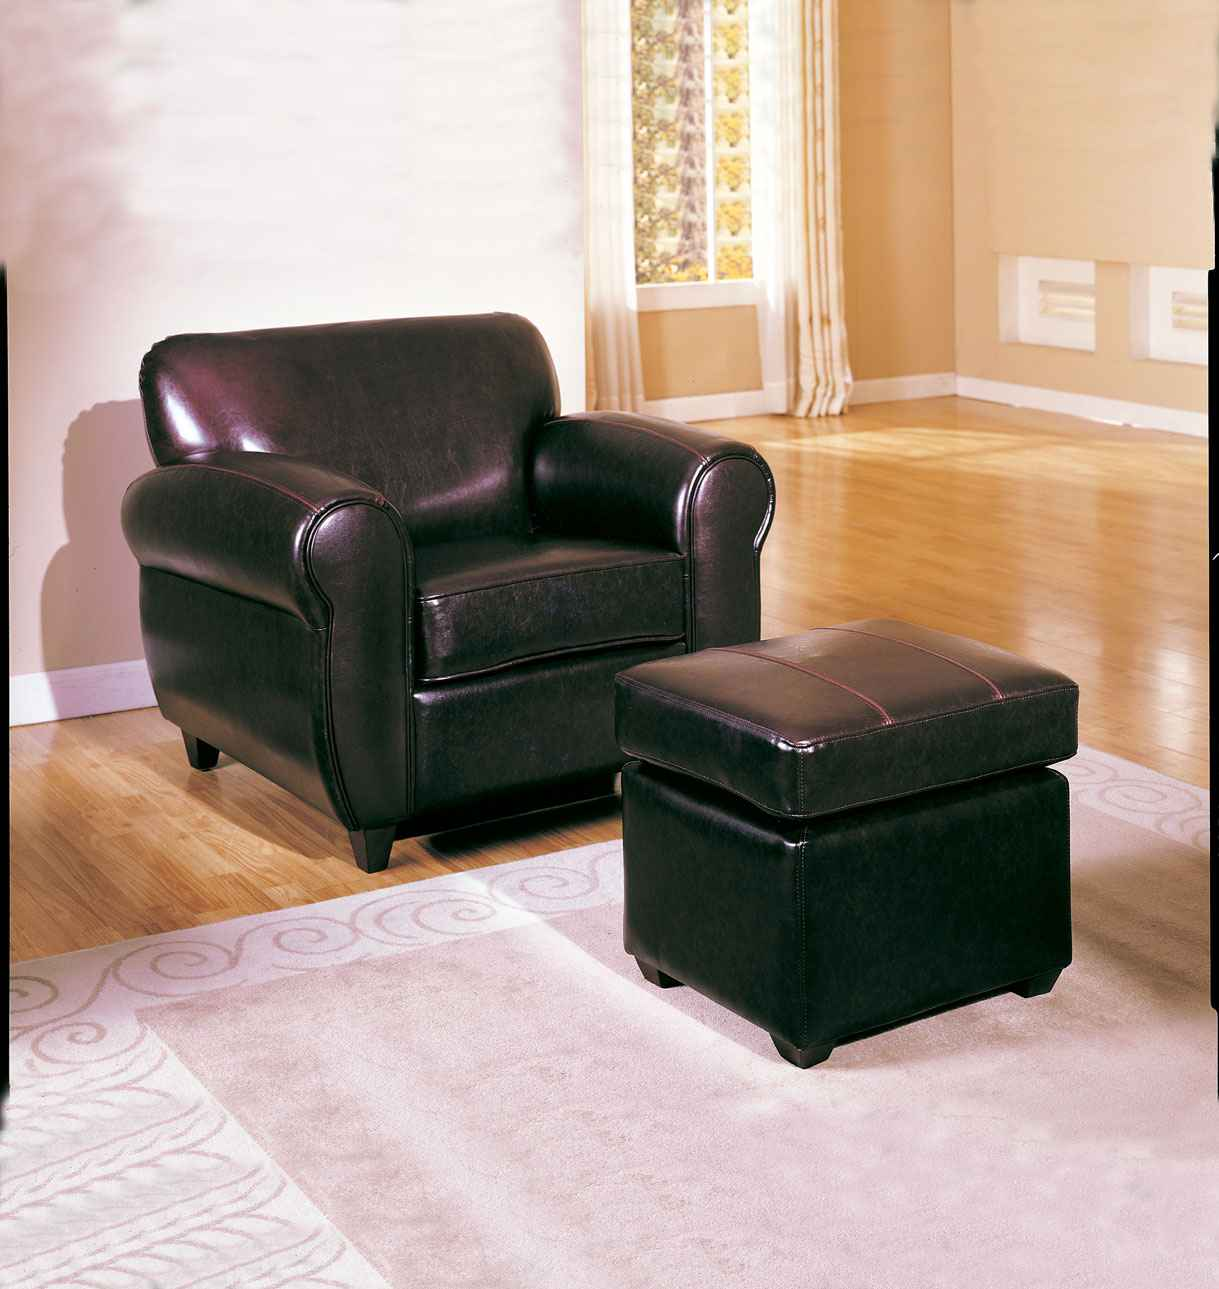 Metro Accent Chair with Ottoman in Espresso